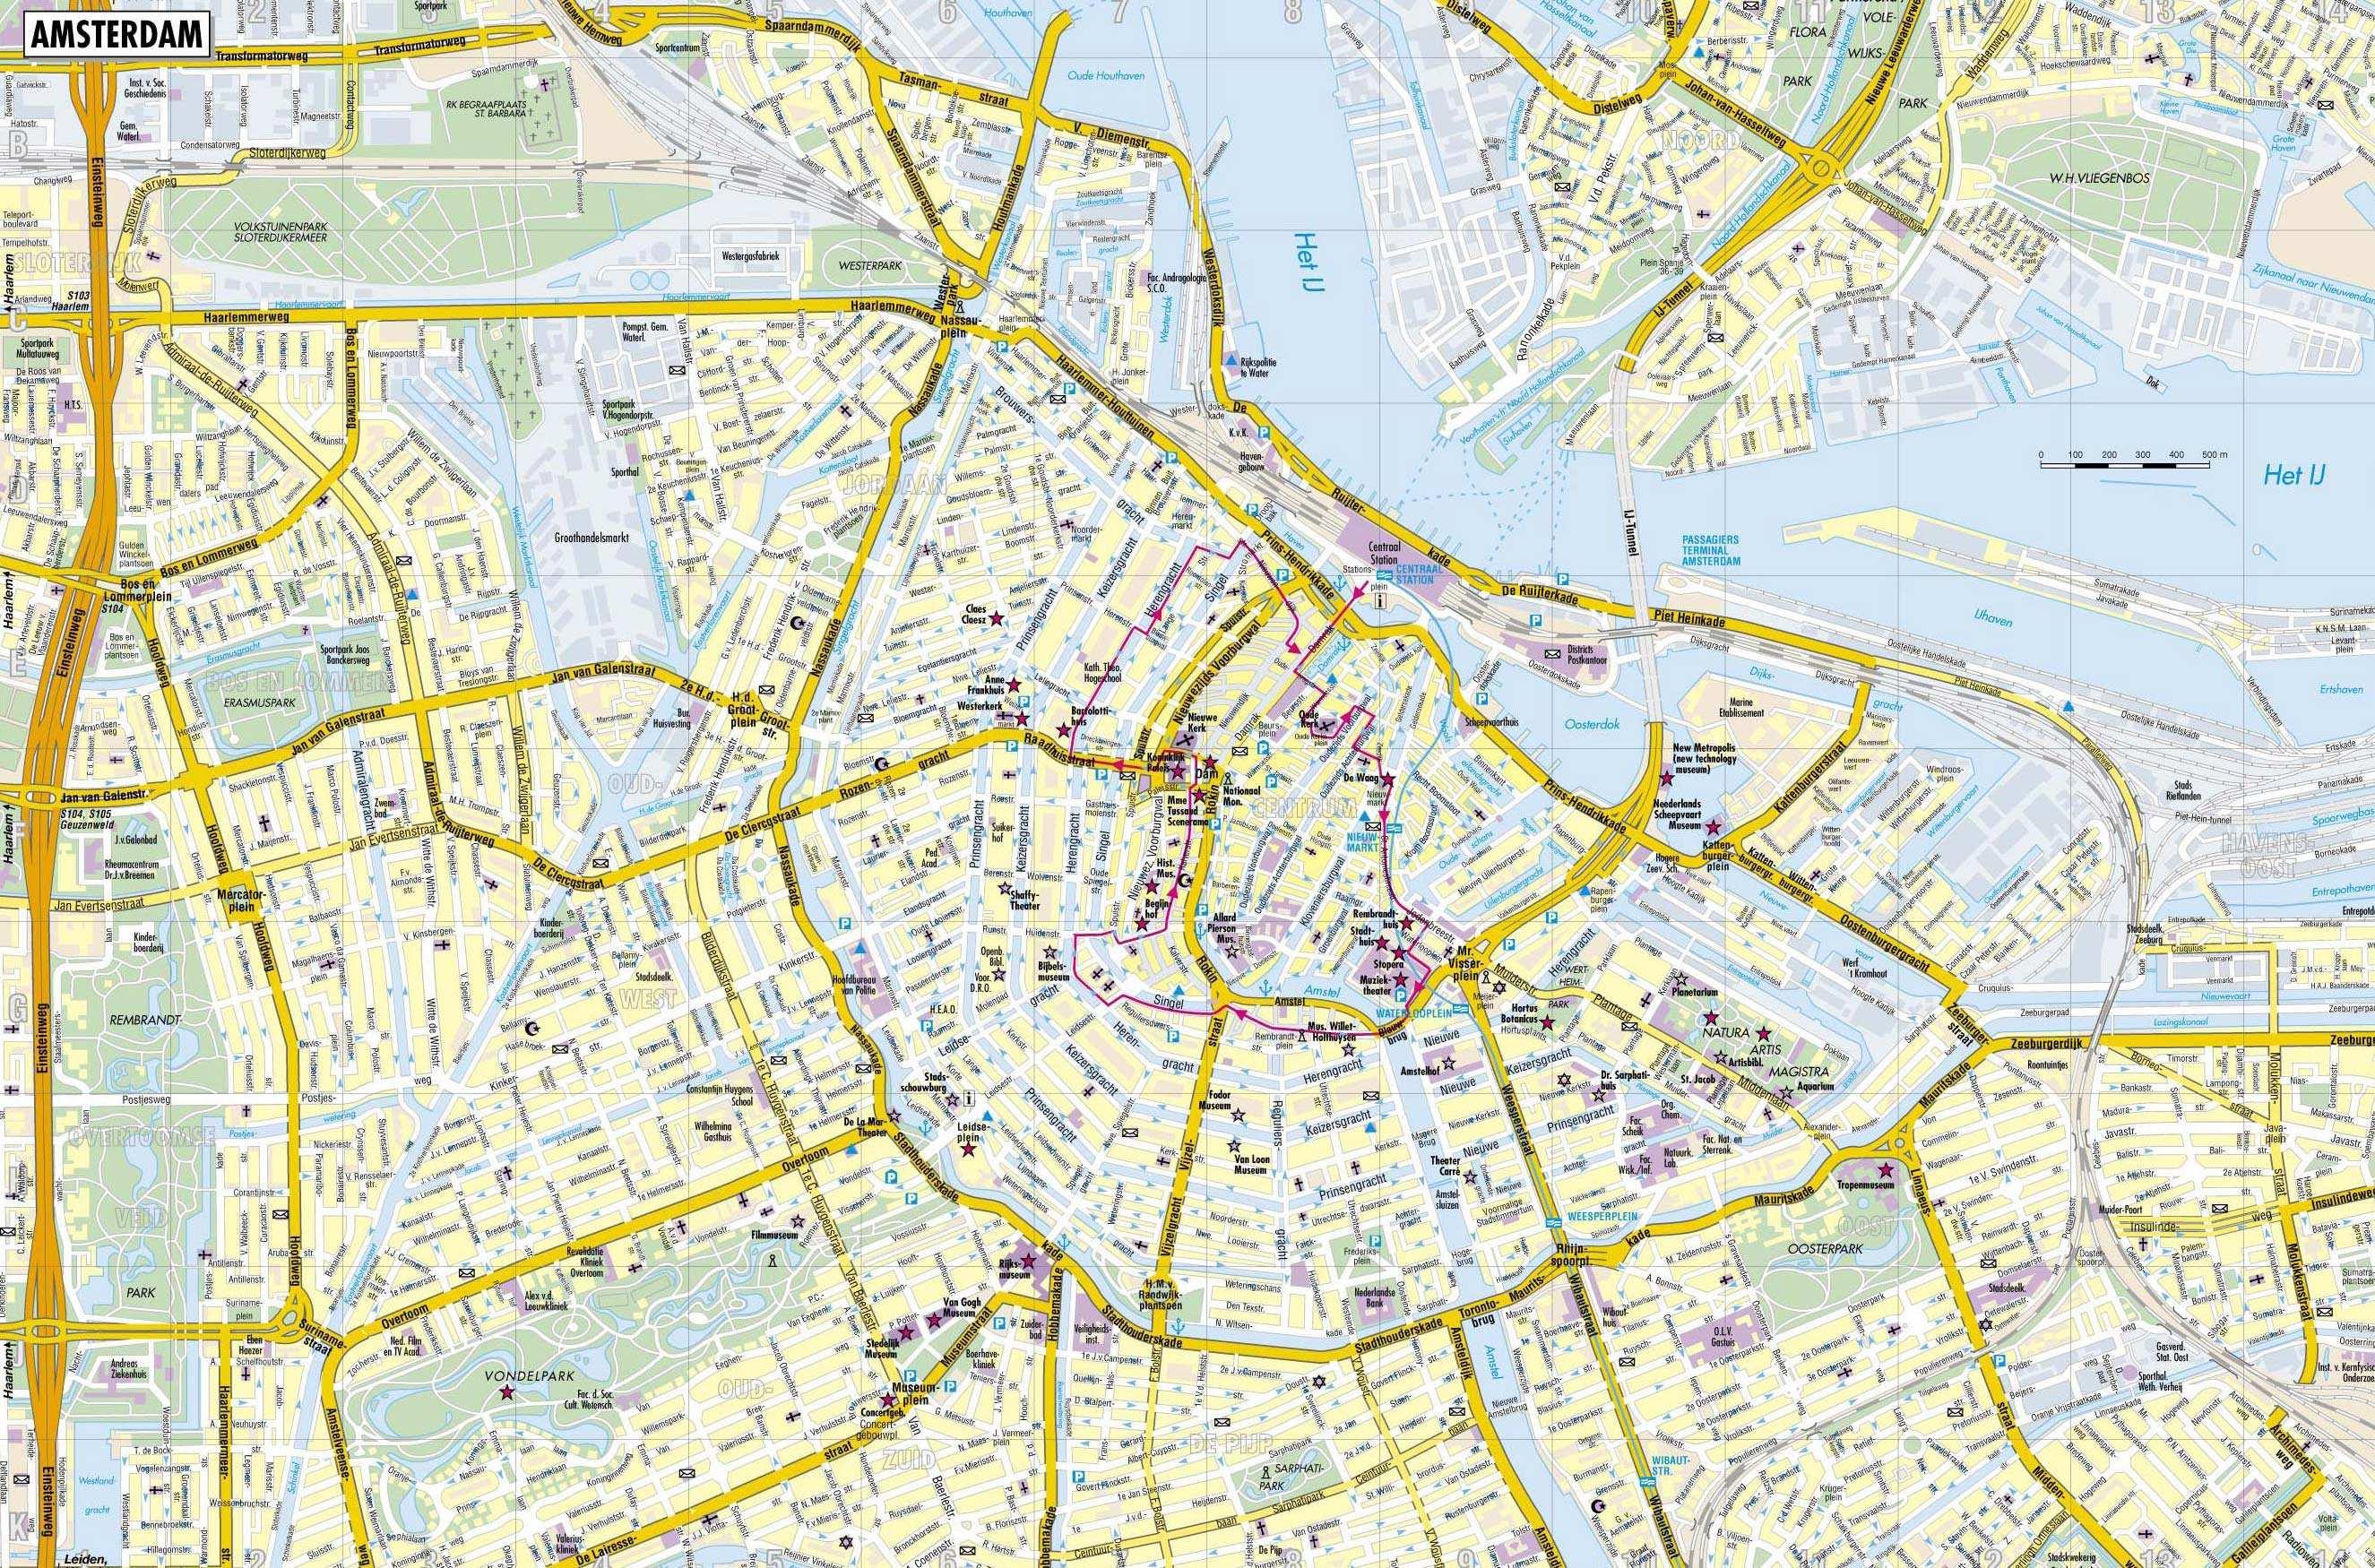 Mapa De Amsterdam Centro.Www Mappi Net Maps Of Cities Amsterdam